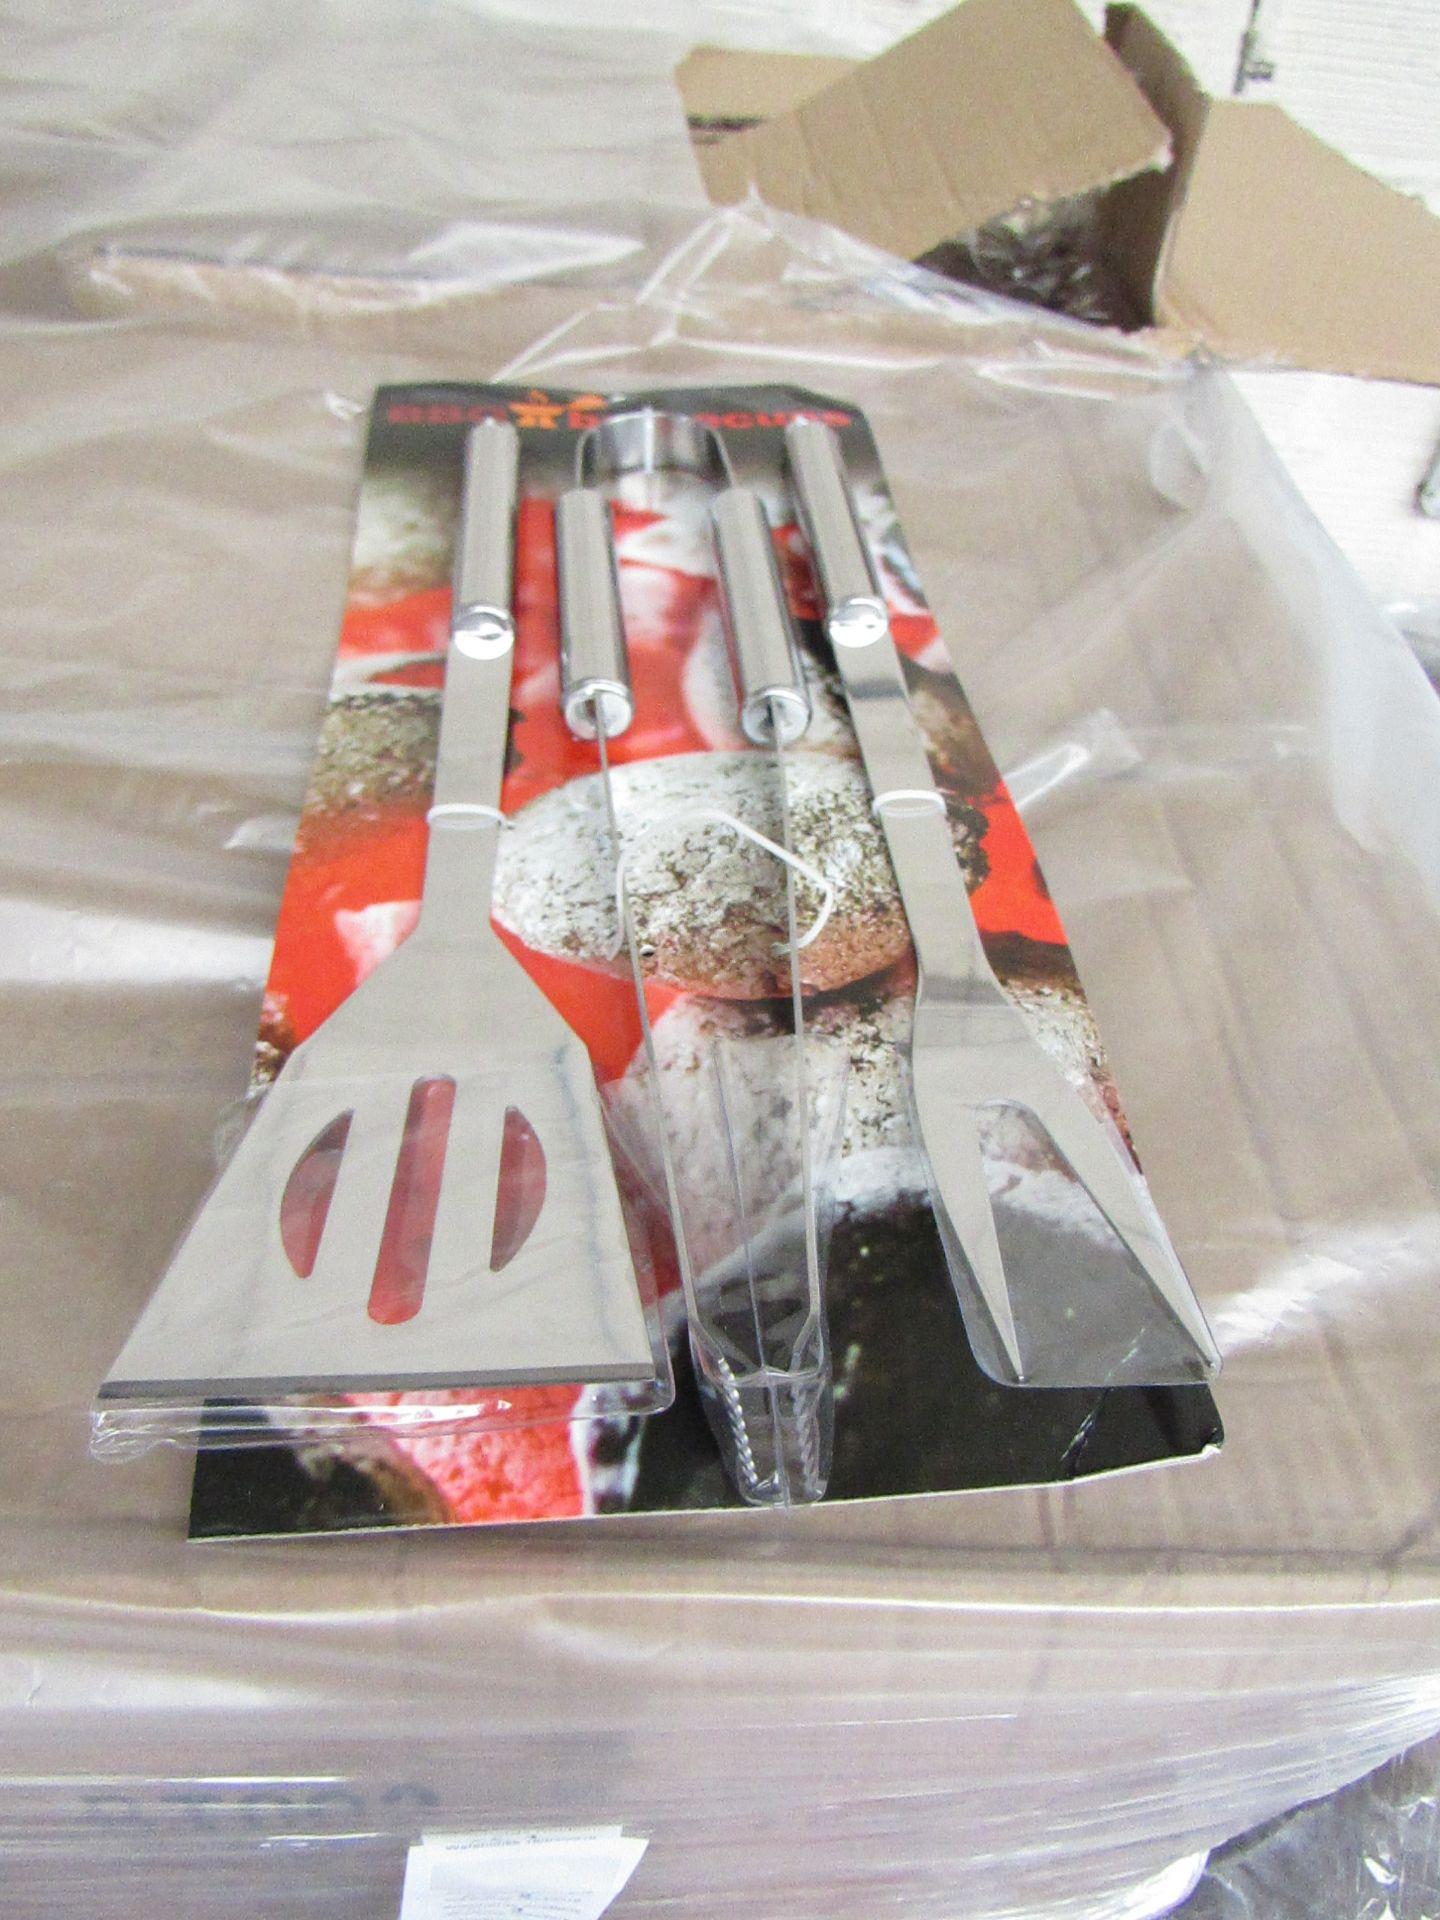 Lot 3 - 5x 3 piece BBQ tool kits, new still attached to POS